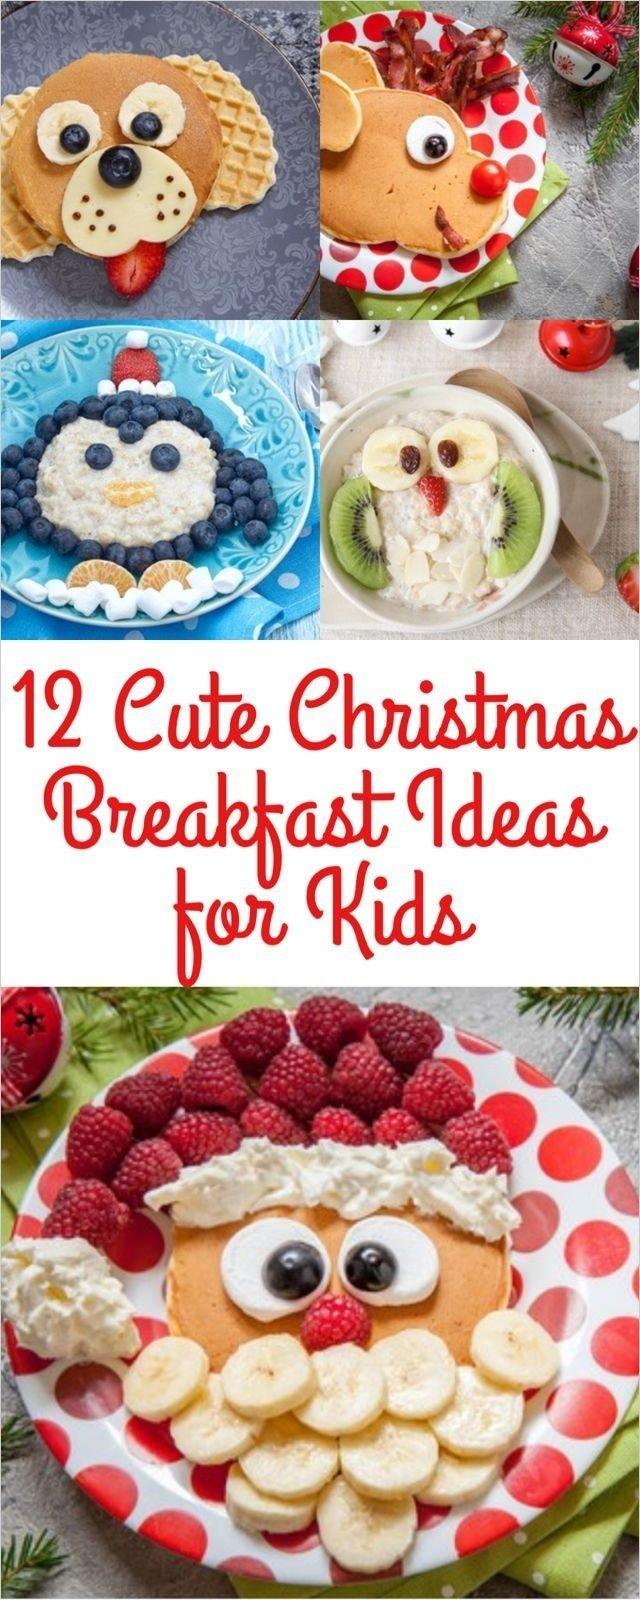 10 Lovely Christmas Breakfast Ideas For Kids 941 best holiday christmas brunch images on pinterest recipes 2020